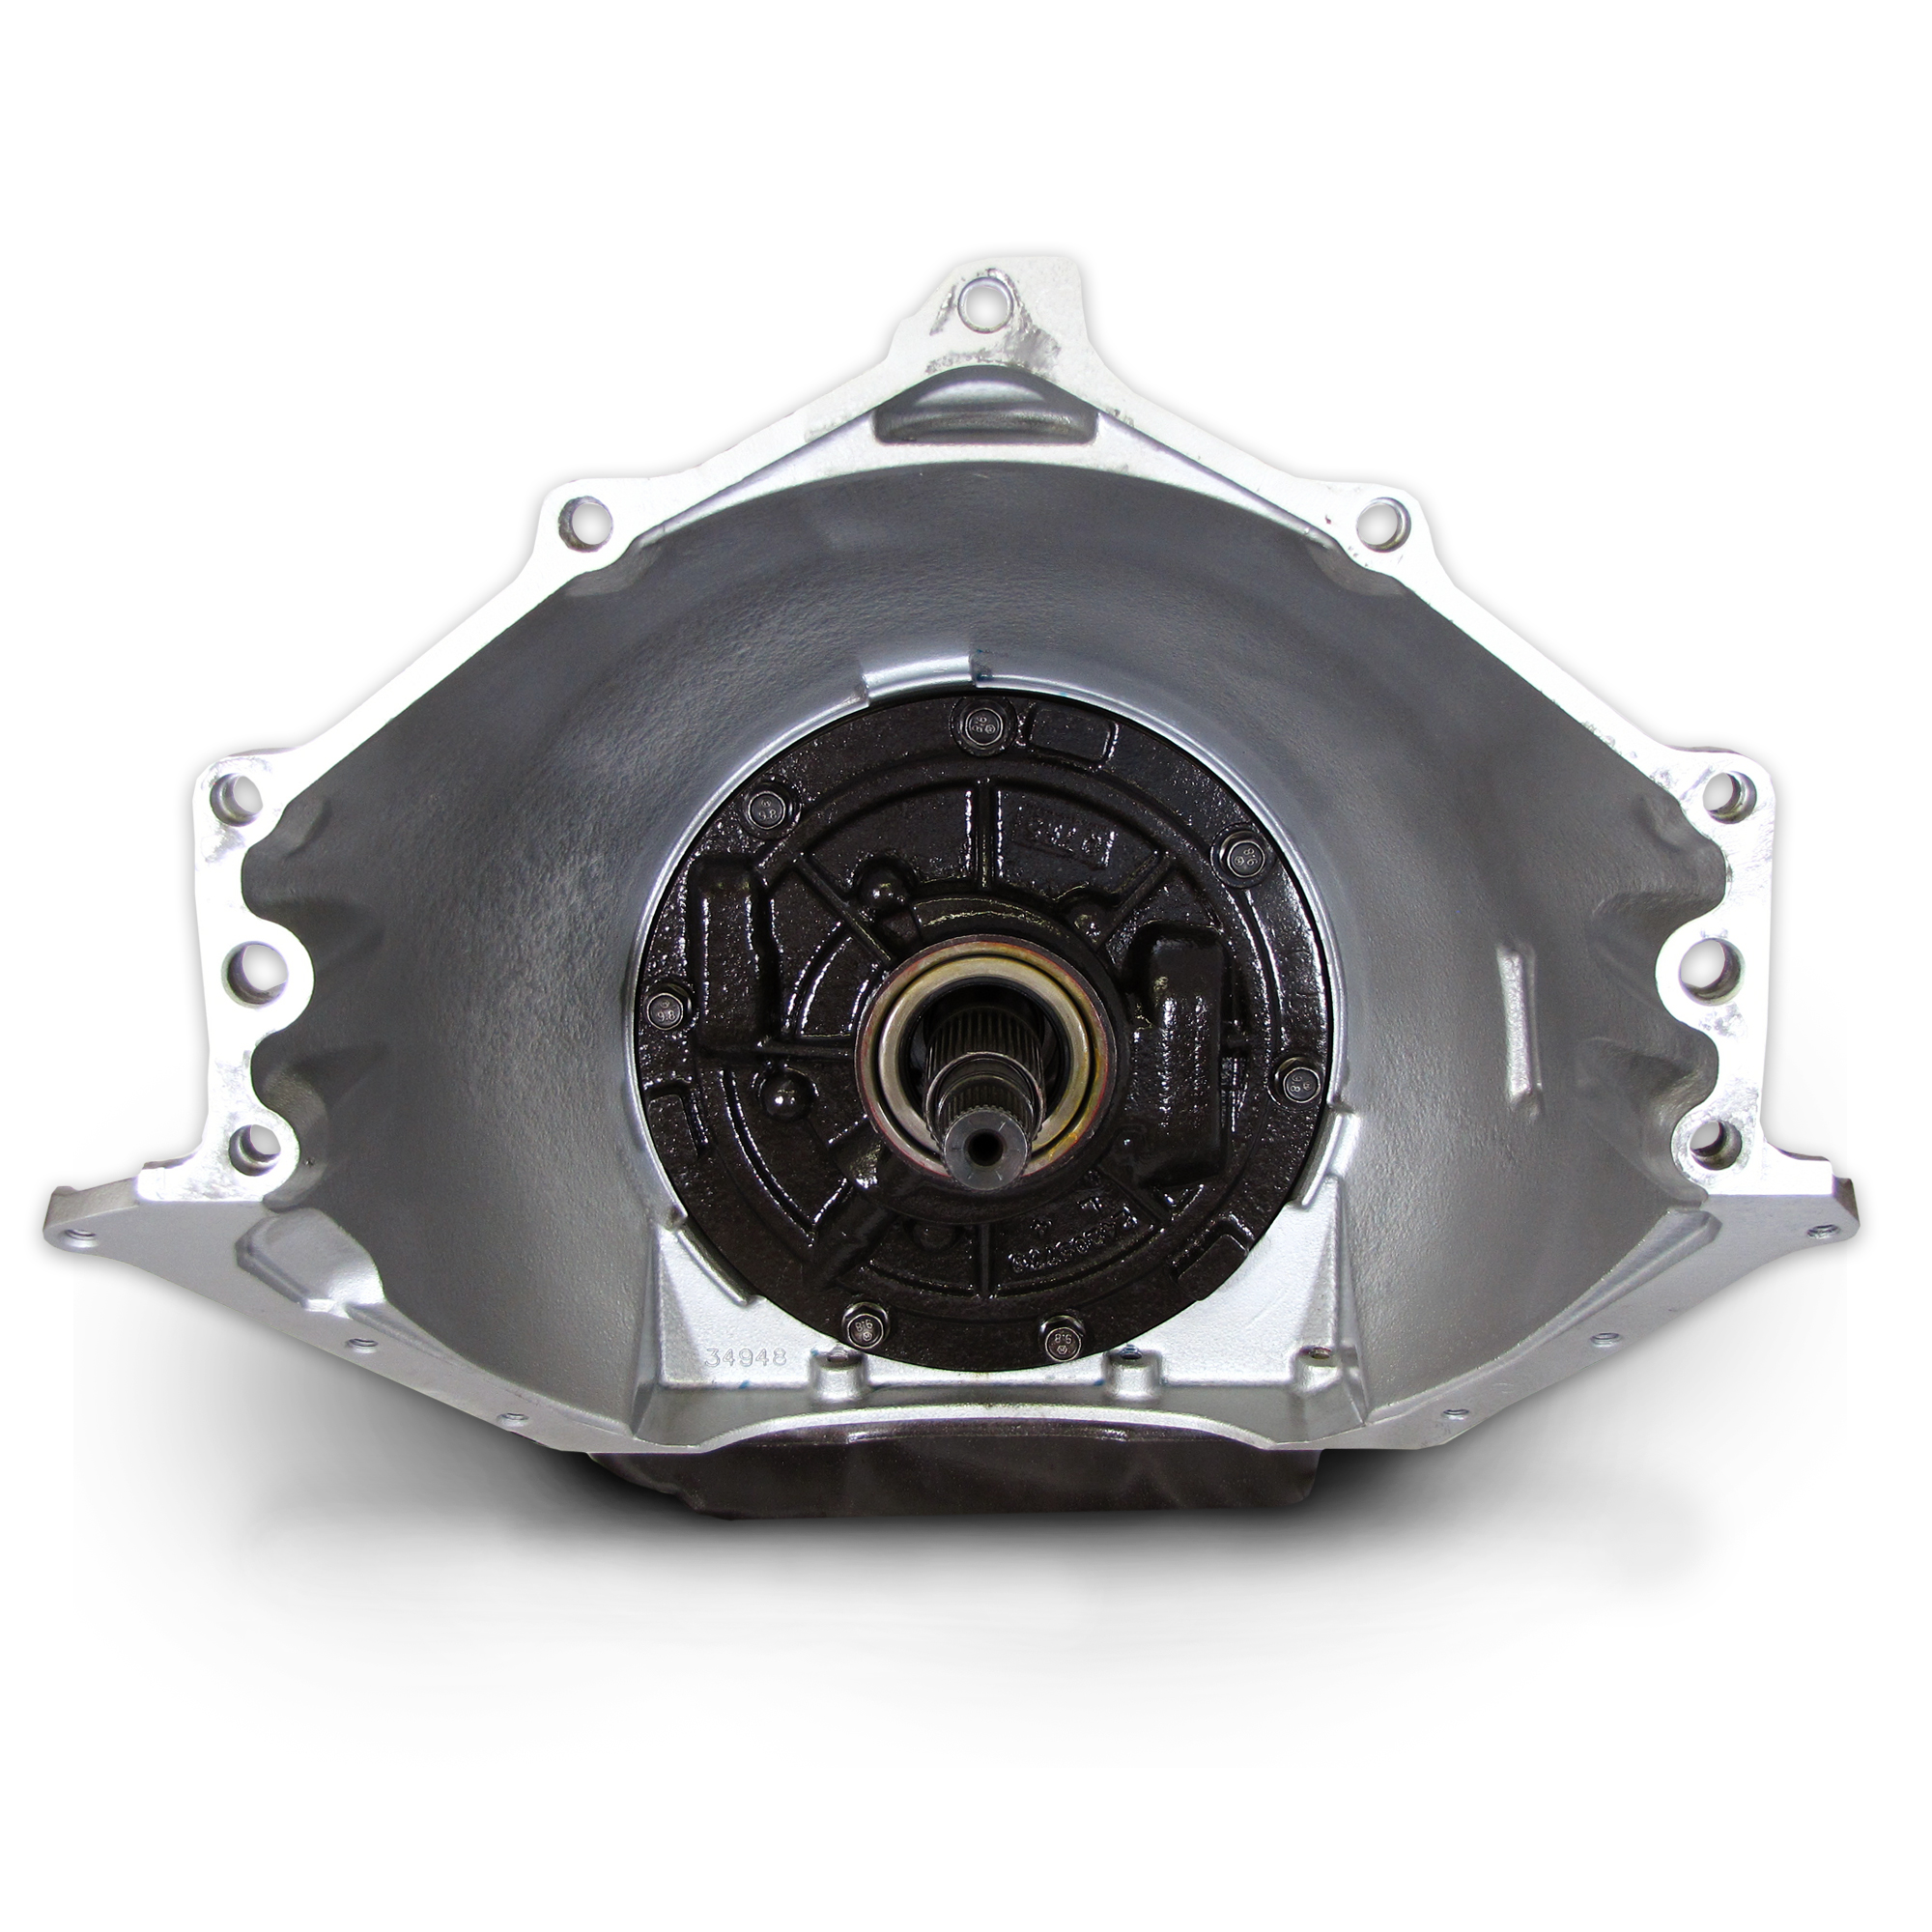 4l80e Front Pump Diagram | Wiring Diagram